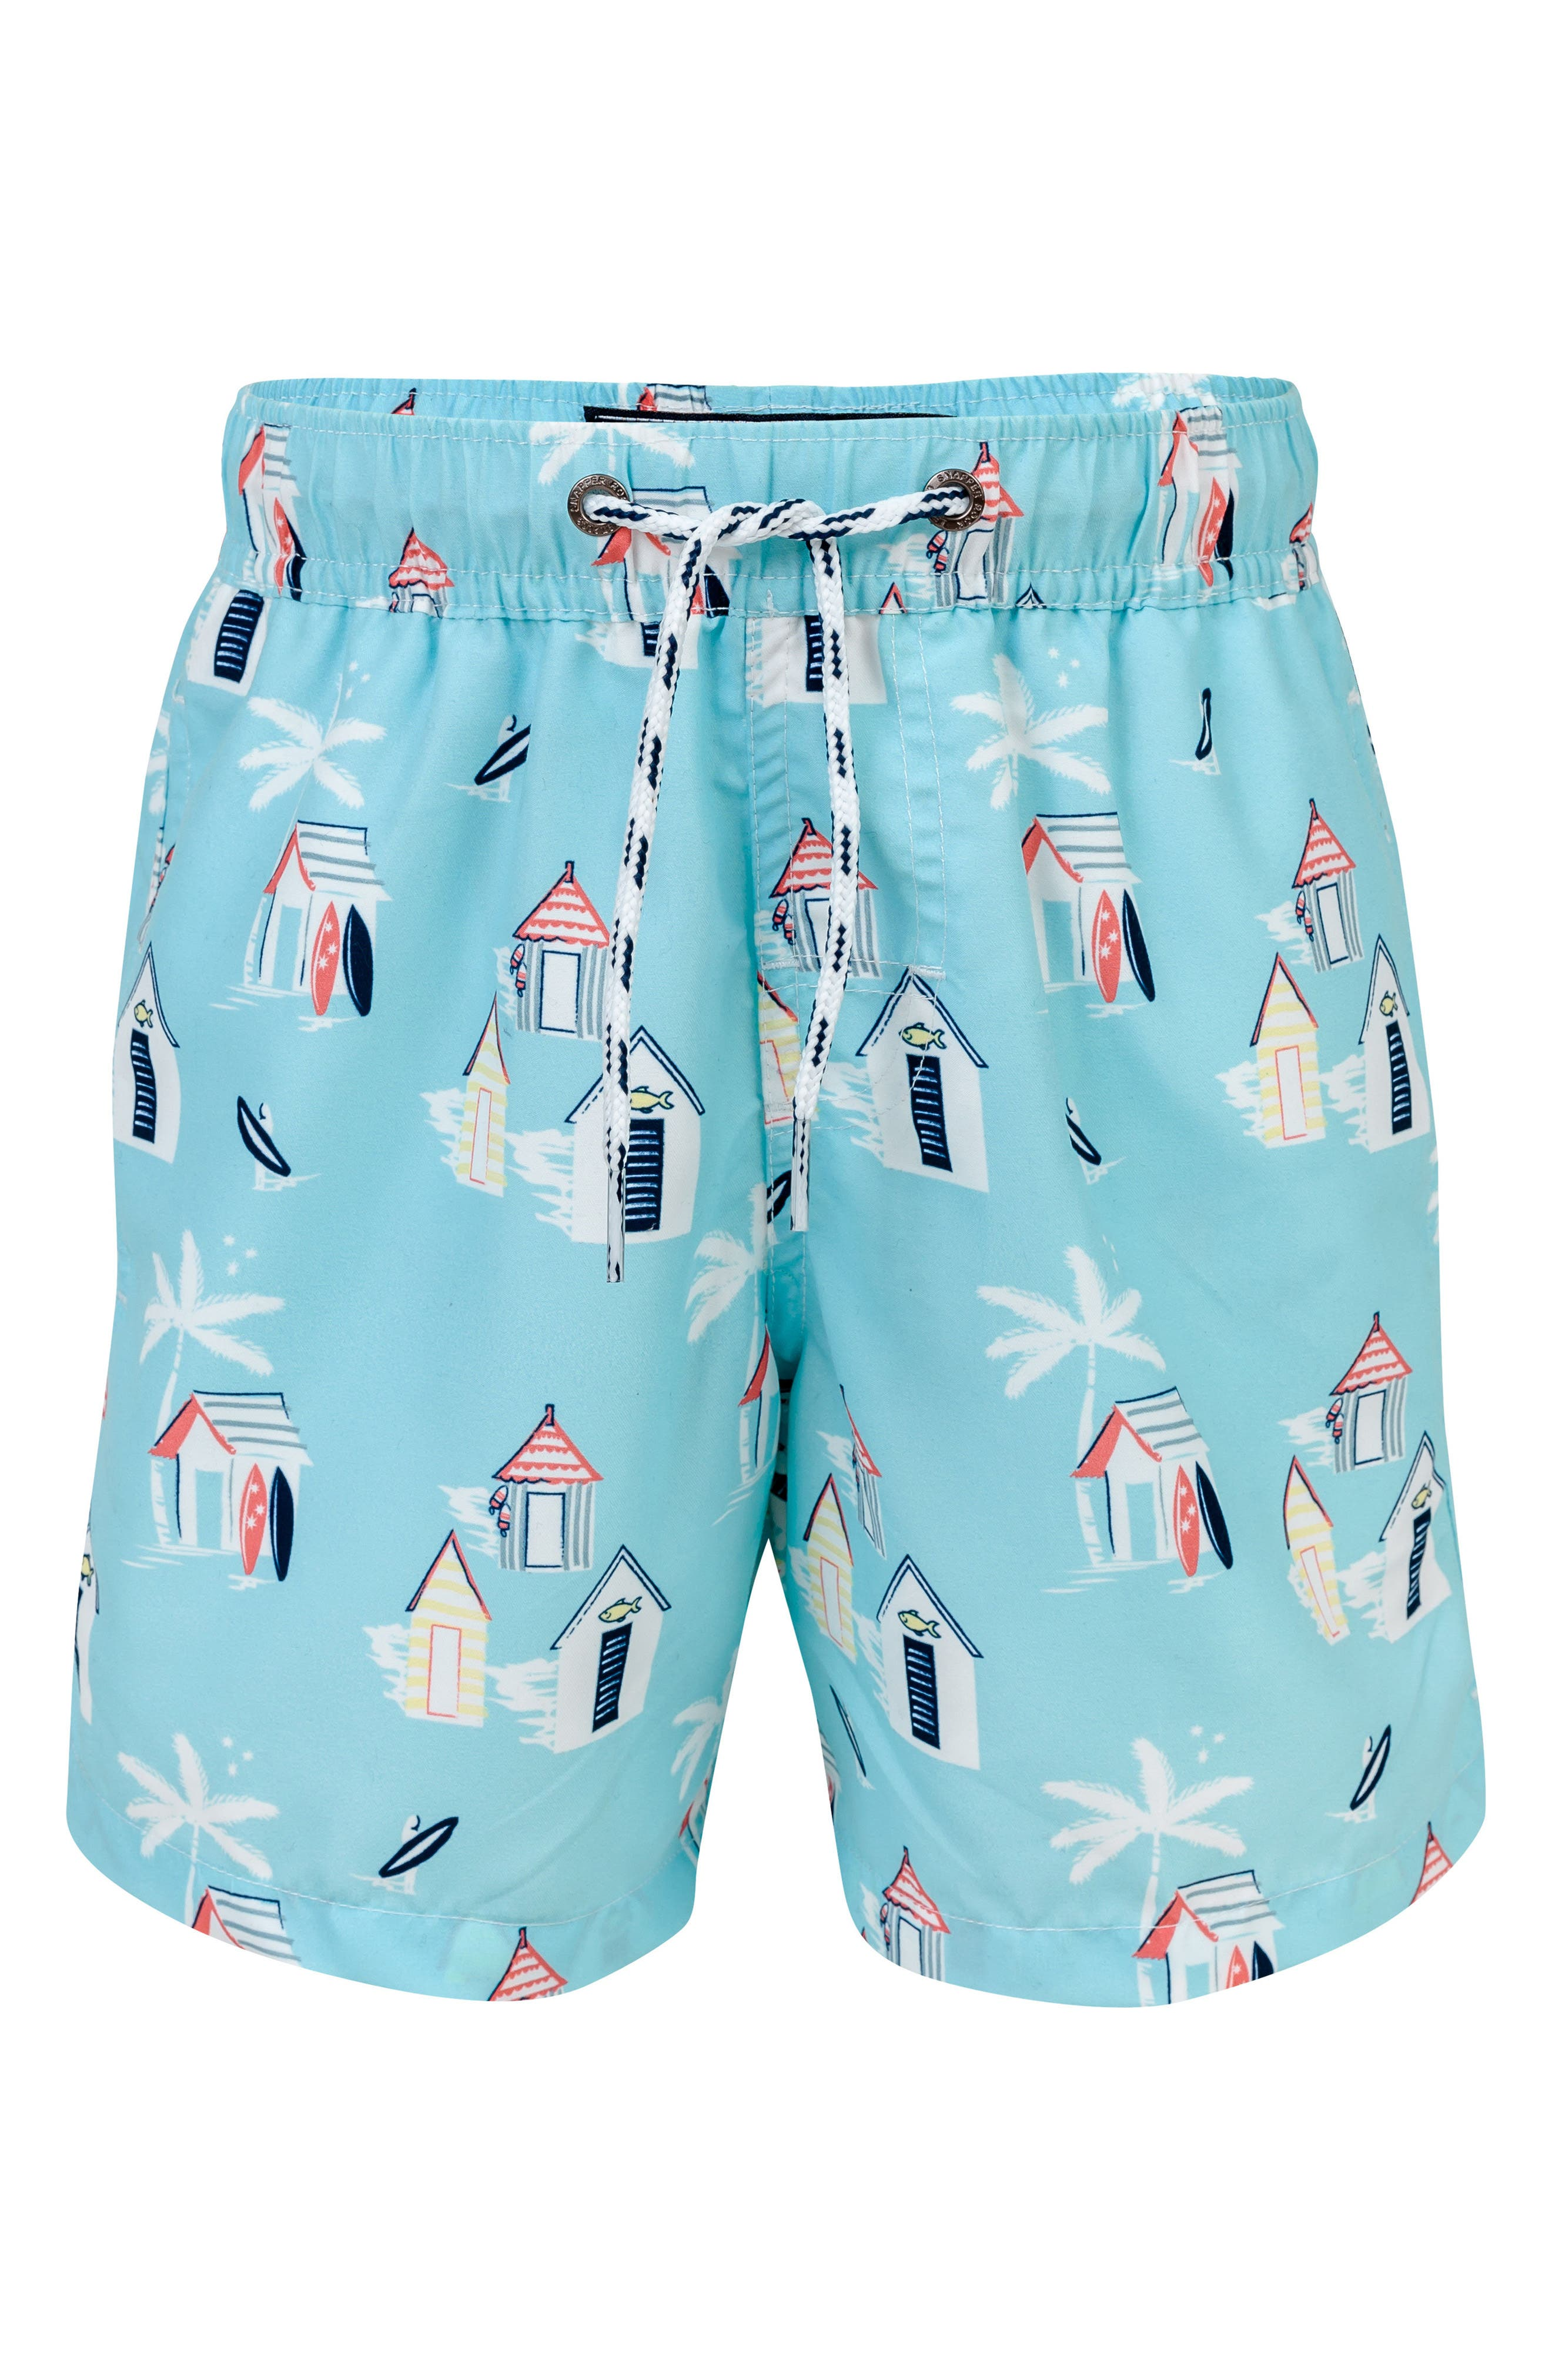 Cabana Palm Board Shorts,                         Main,                         color, 450